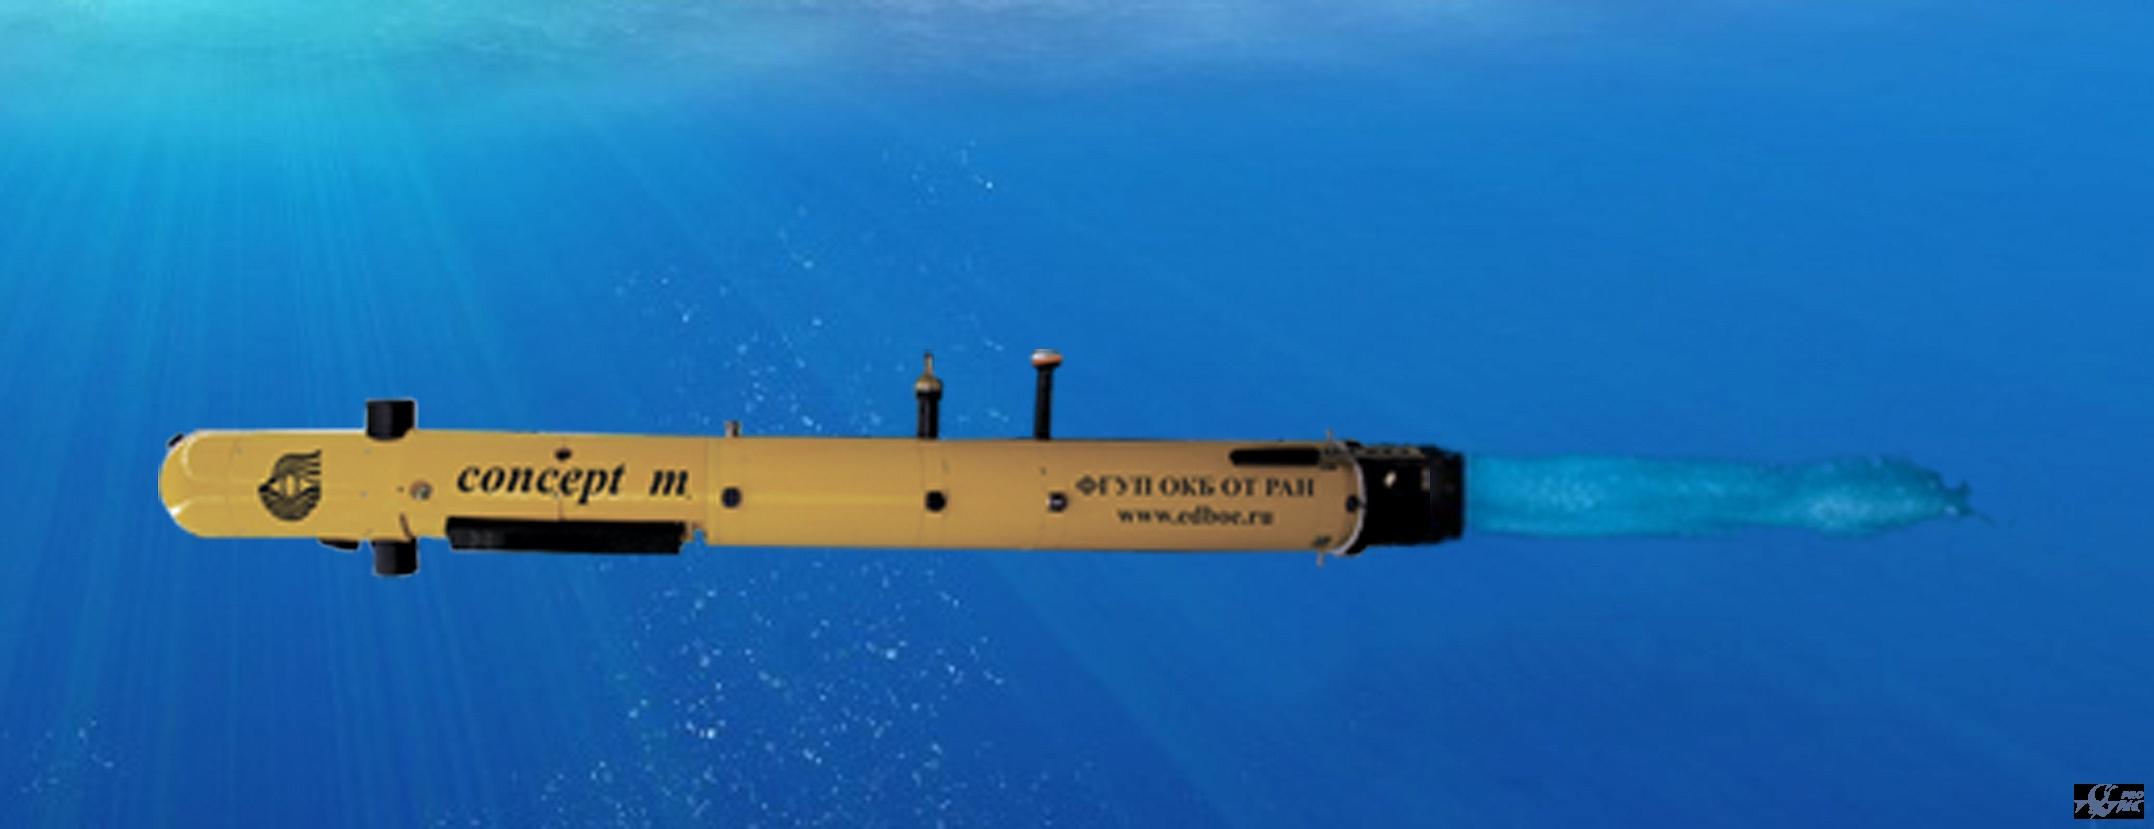 Underwater Drones of the Russian Navy Concept%20m%20(2)